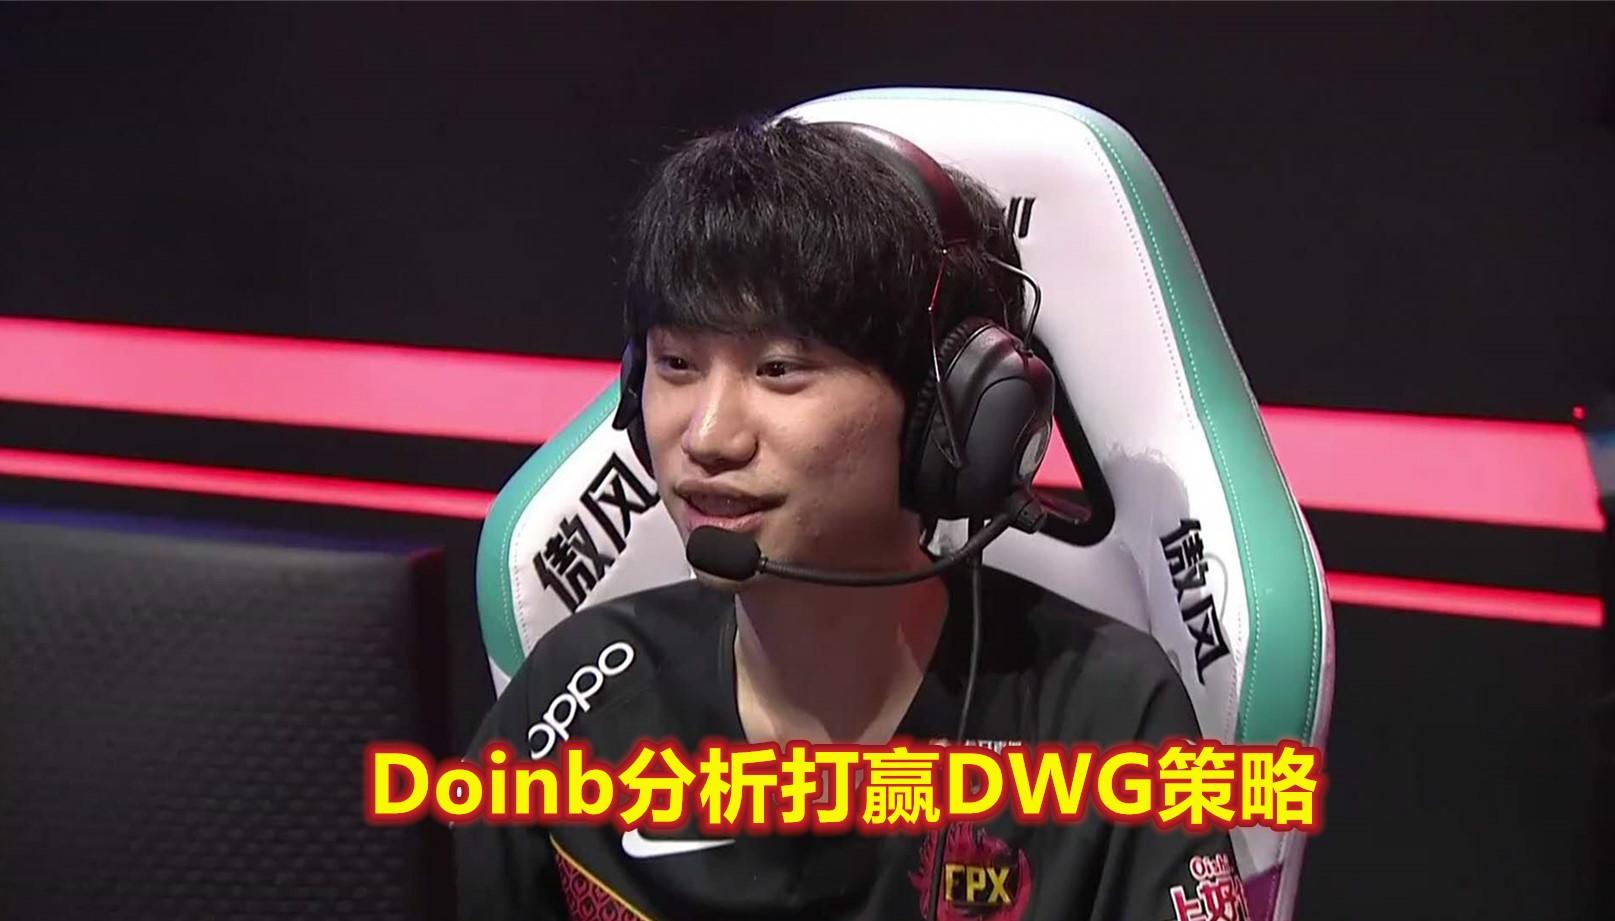 """TES和DWG五五開""!Doinb分析打贏DWG策略,隻有滔搏能做到-圖4"